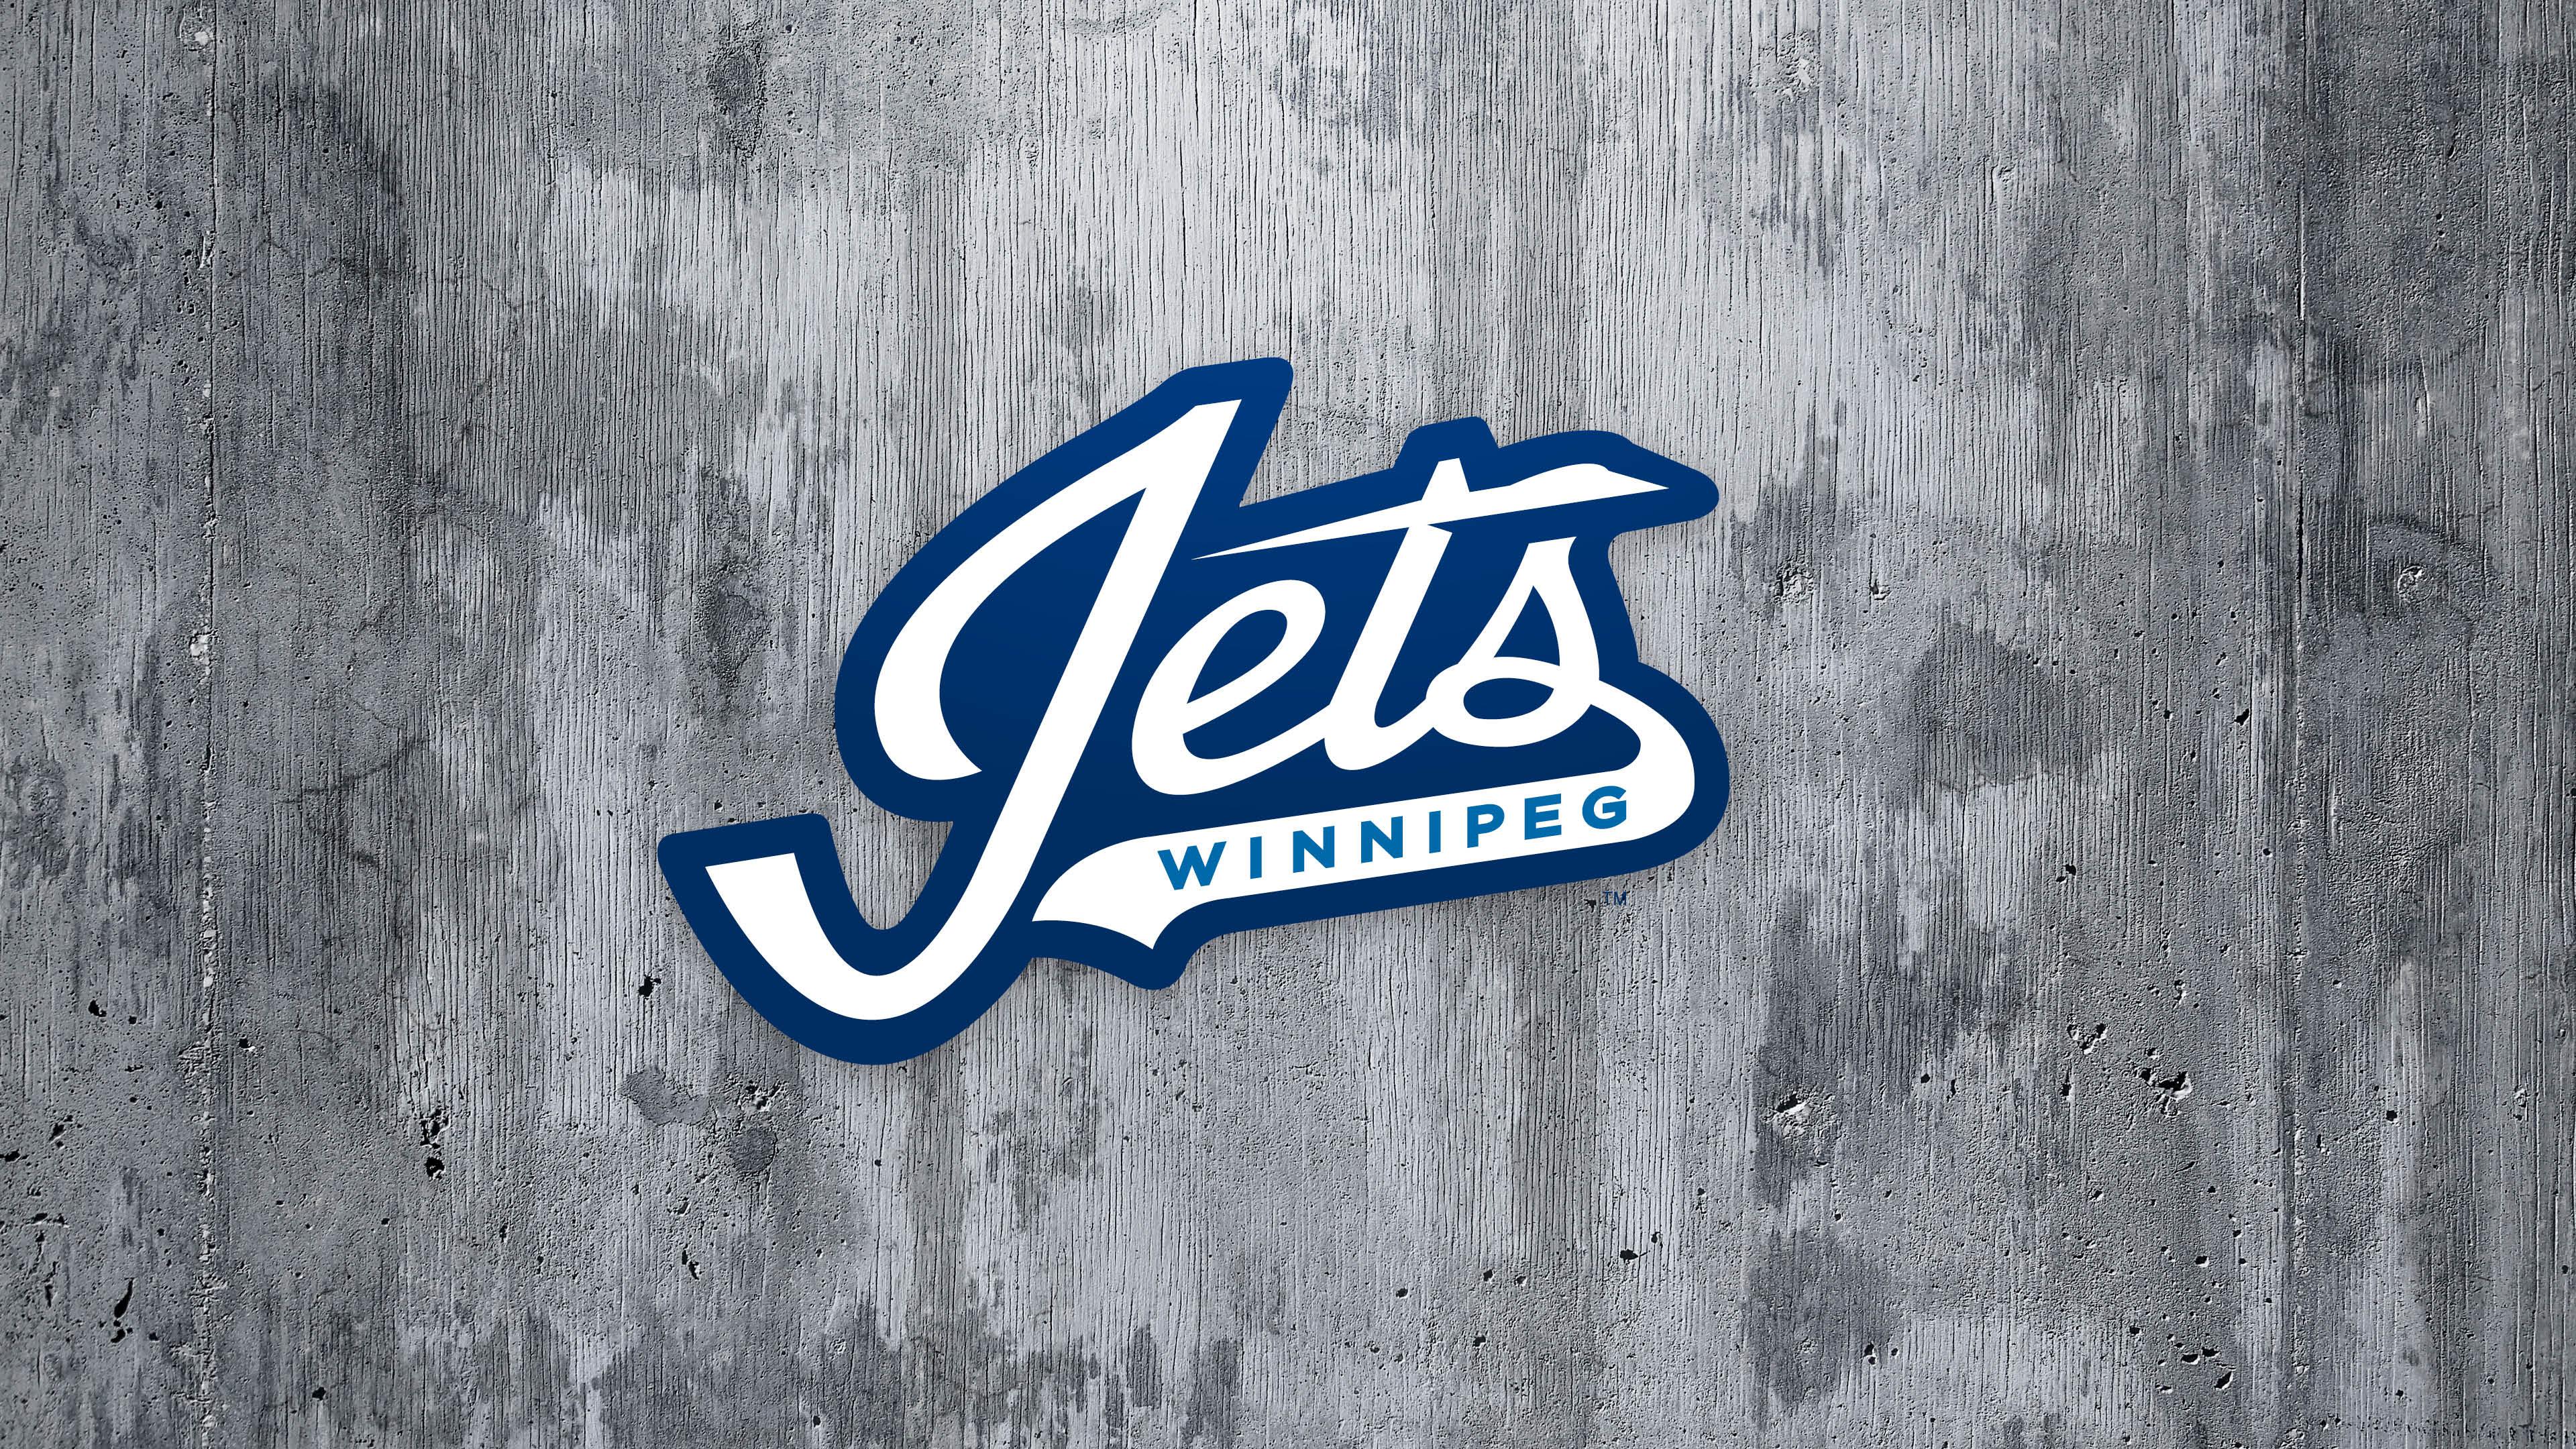 Desktop & Mobile Wallpapers - Winnipeg Jets Nhl Hockey Iphone Wallpaper 2019 , HD Wallpaper & Backgrounds